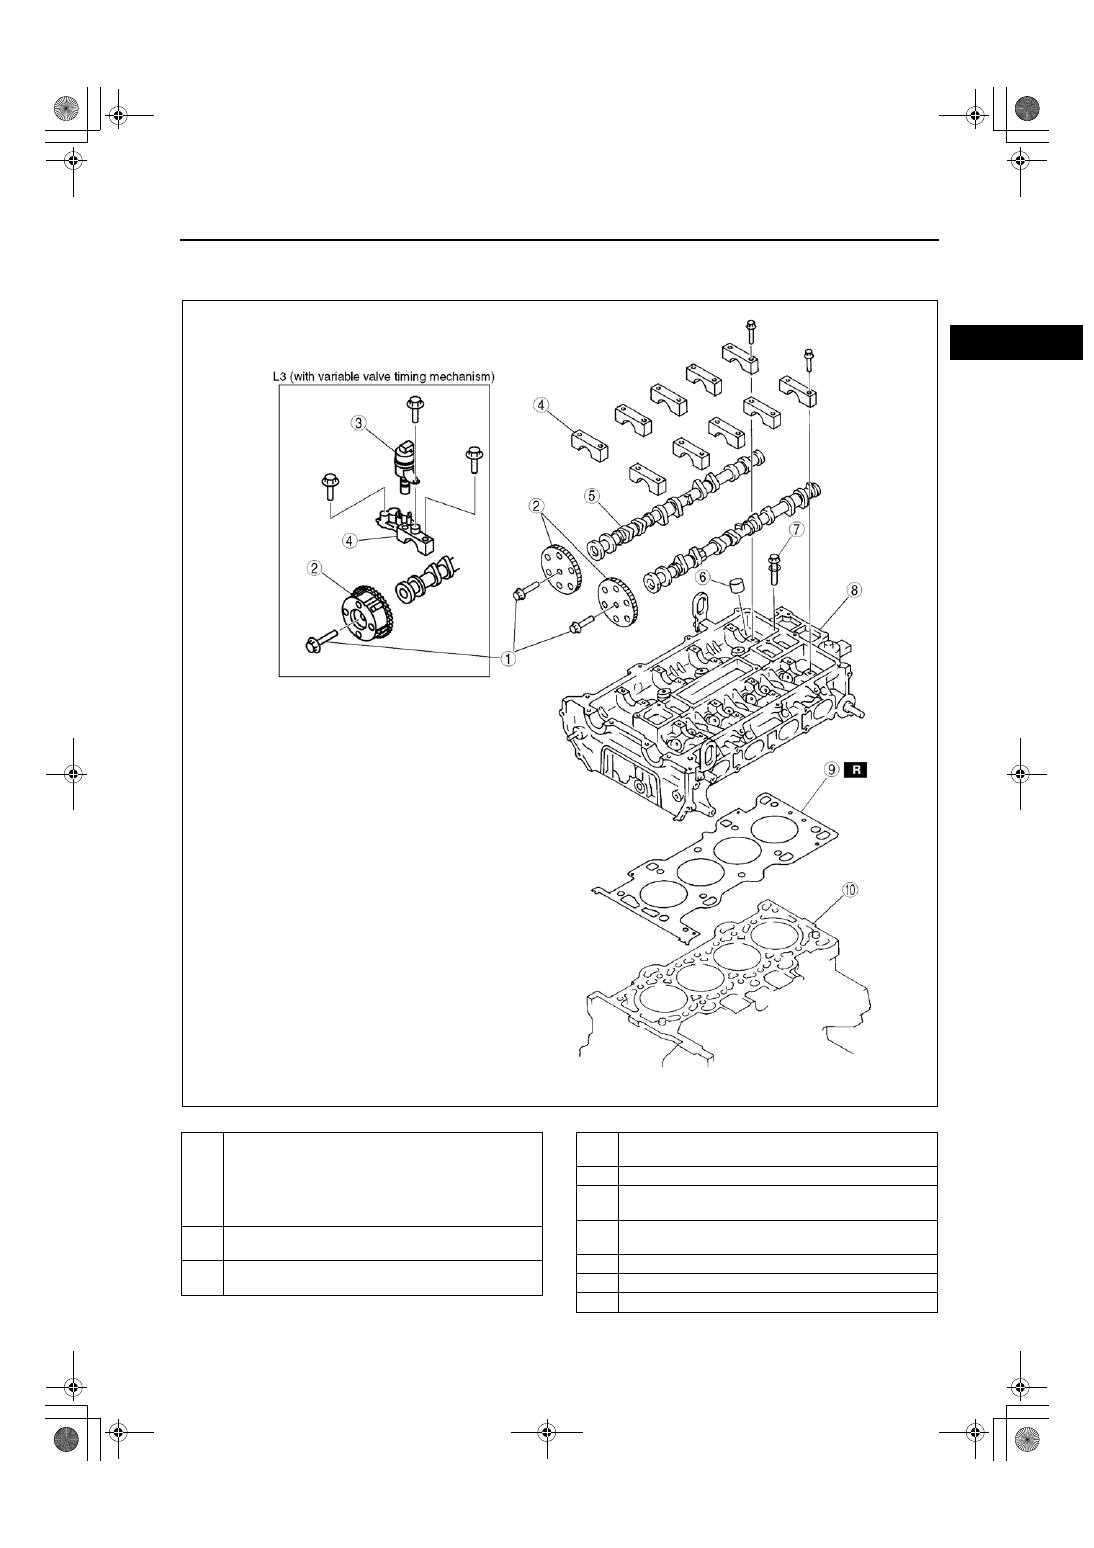 Mazda Engine L8 Lf L3 Manual Part 6 Valve Timing Diagram